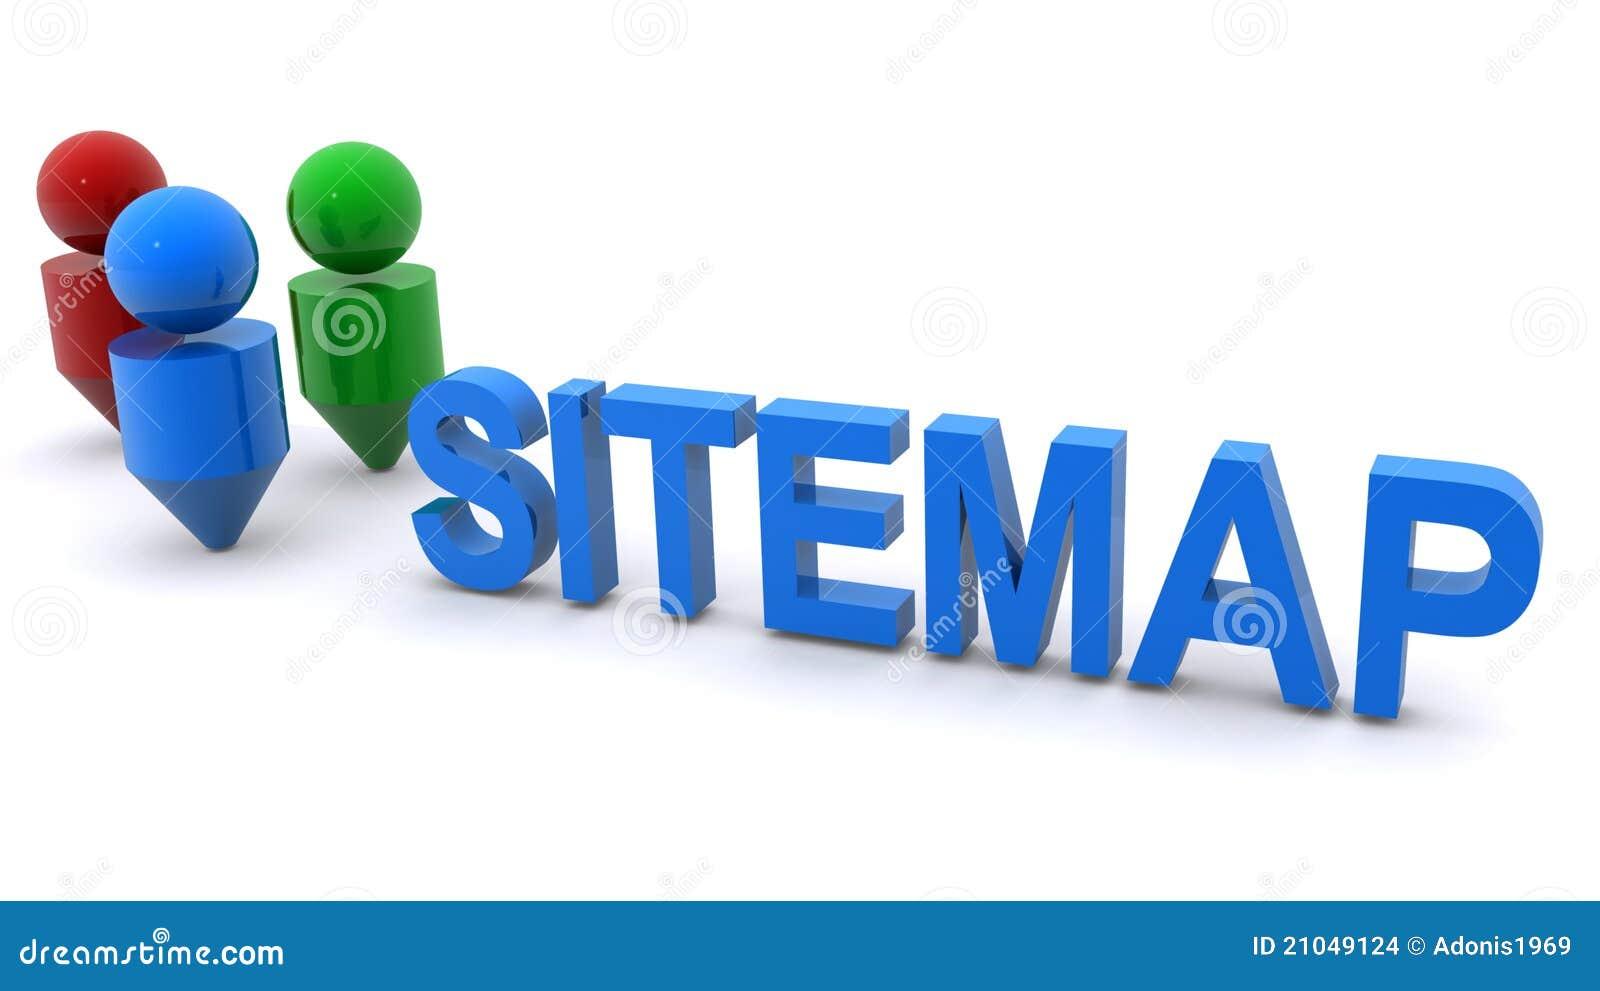 Sitemap illustration